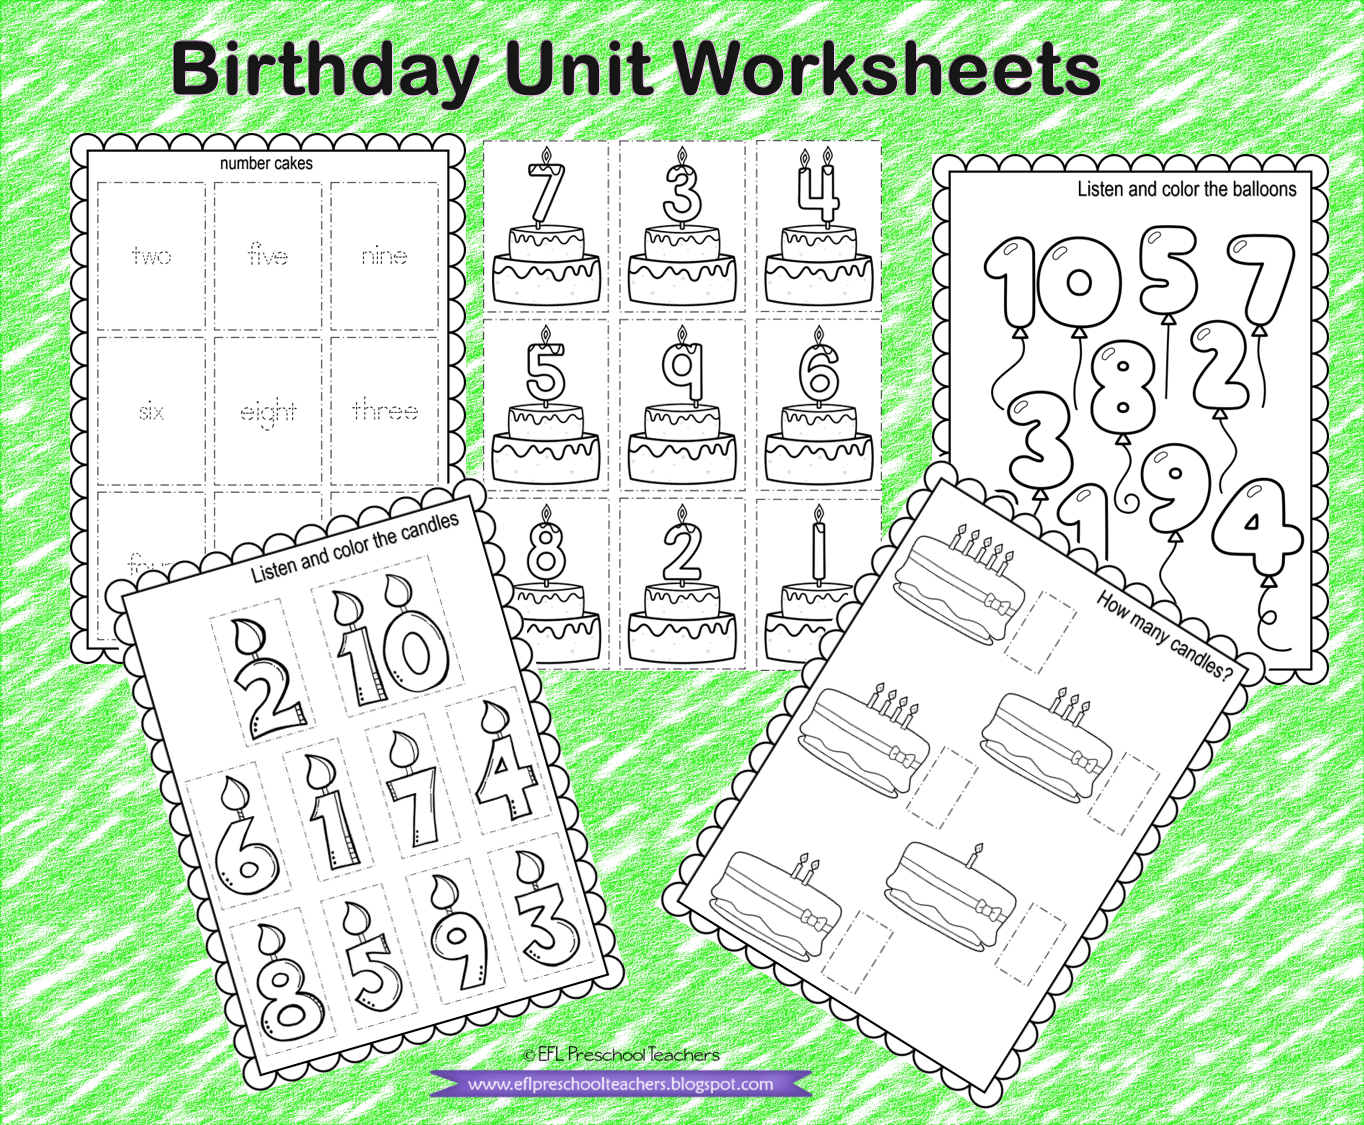 Birthday Unit Worksheets For Kindergarten Ell In 2021 Kindergarten Worksheets Kindergarten Ell English Language Learners [ 1125 x 1364 Pixel ]